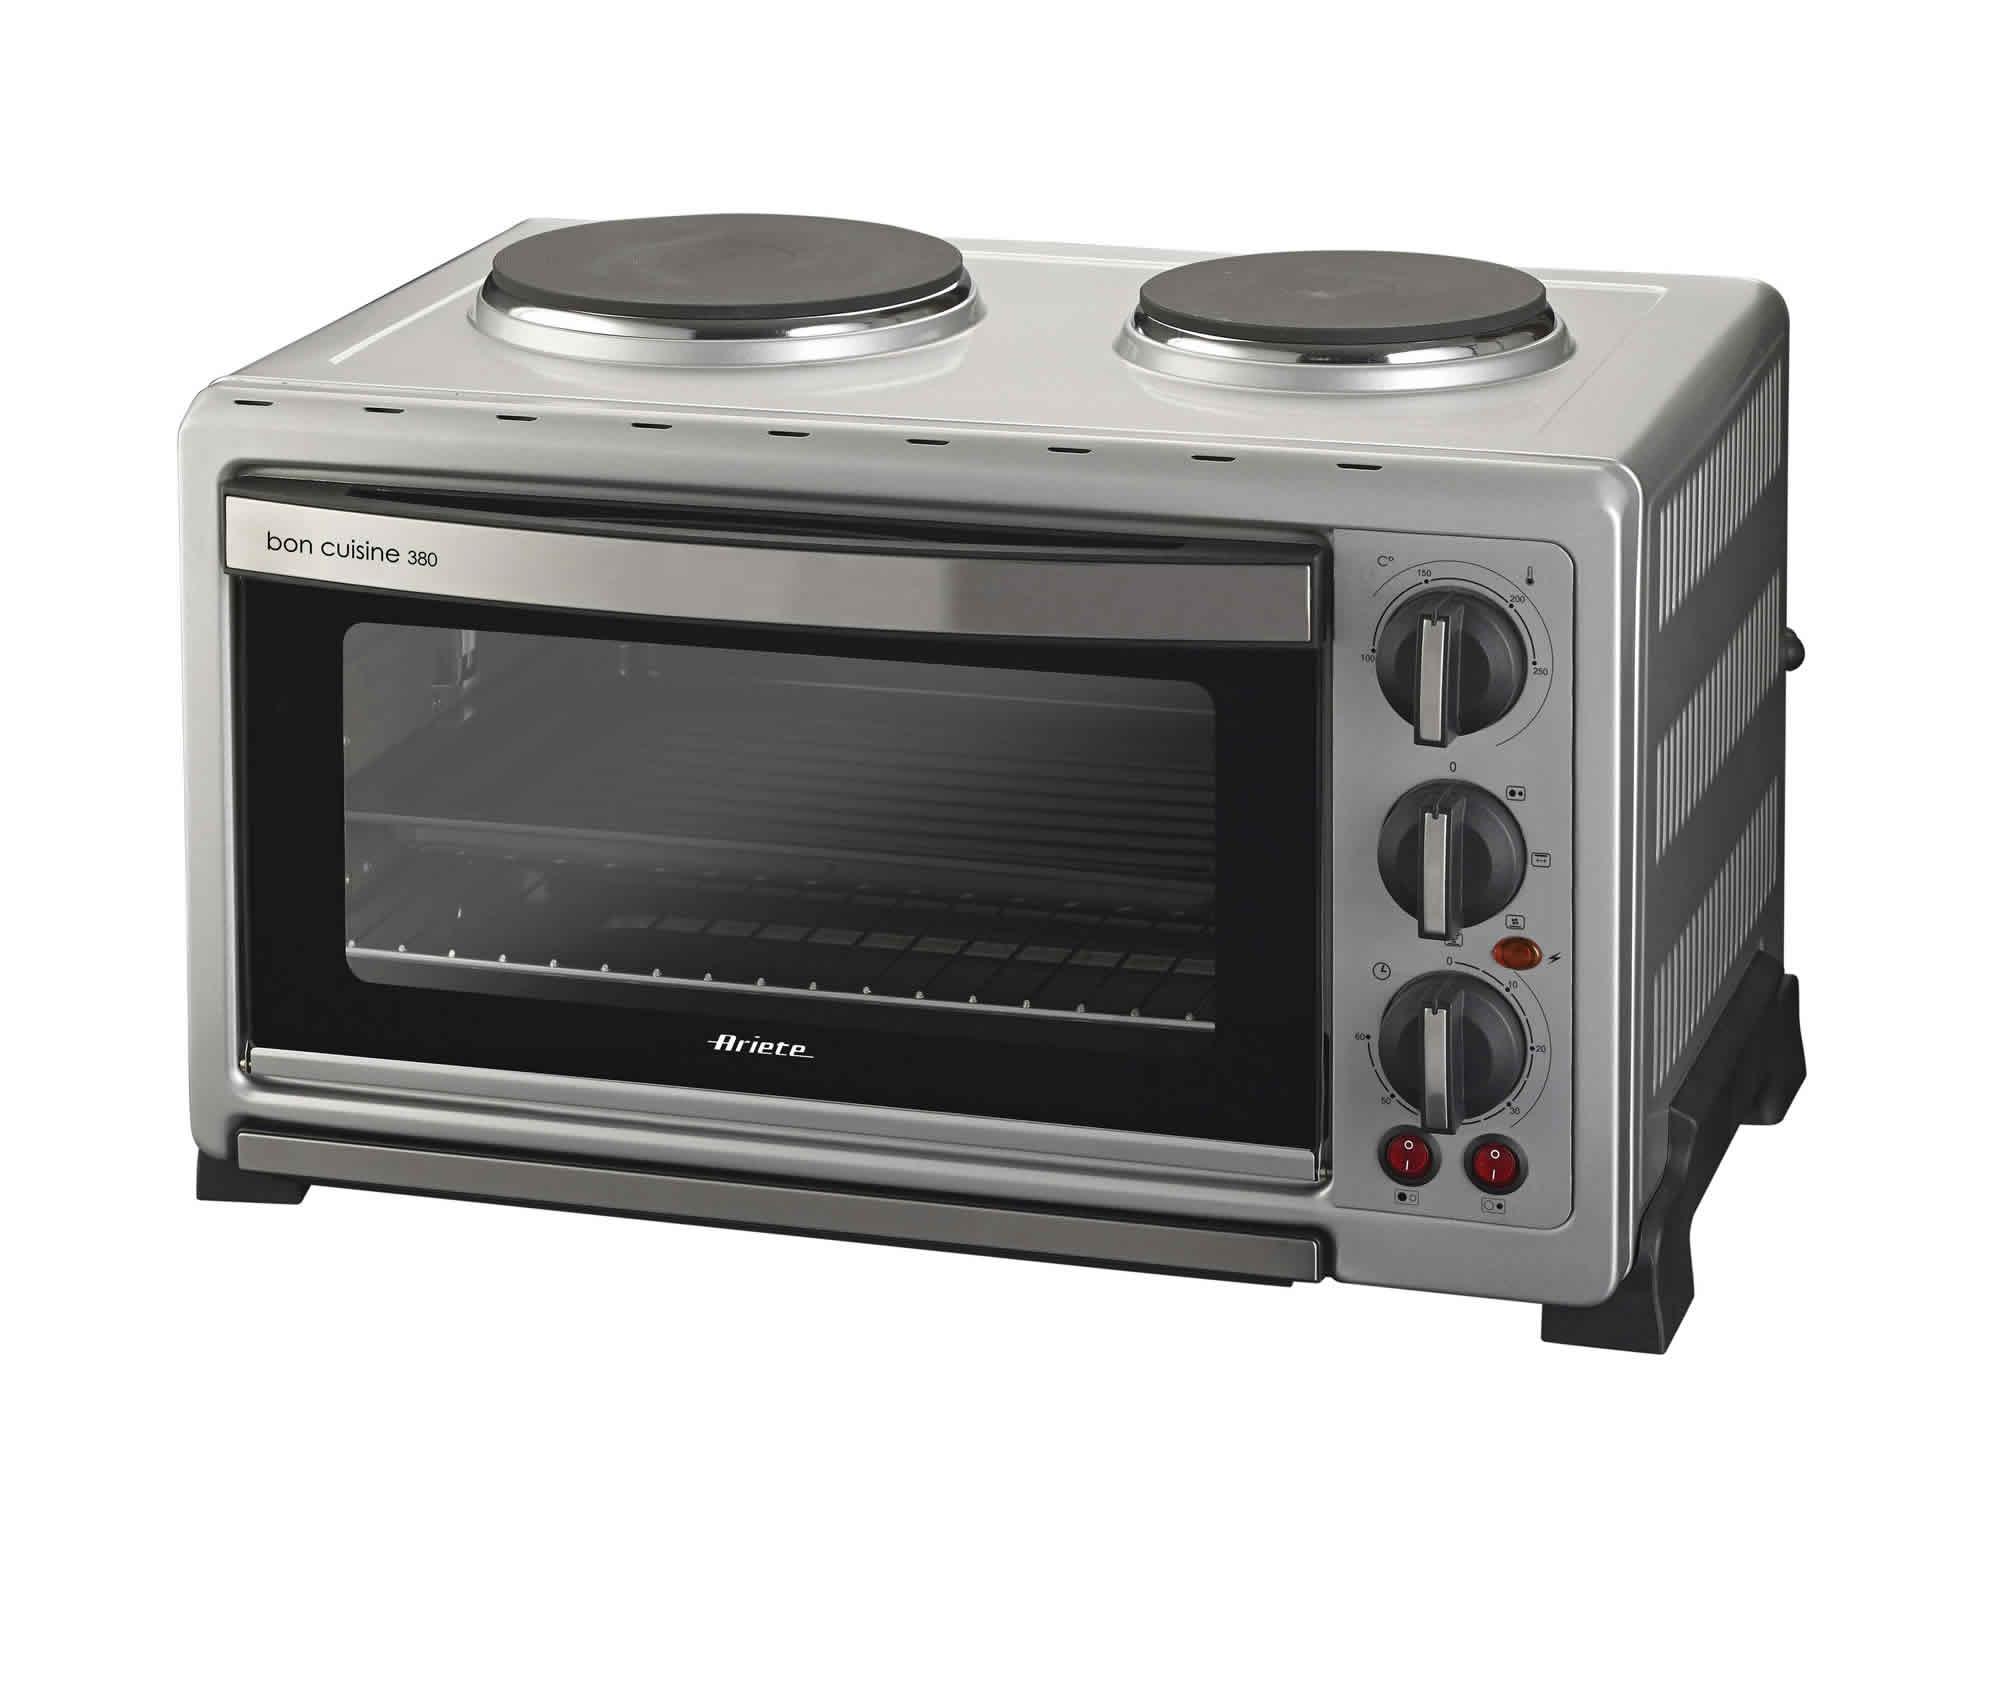 Image of Bon Cuisine 380